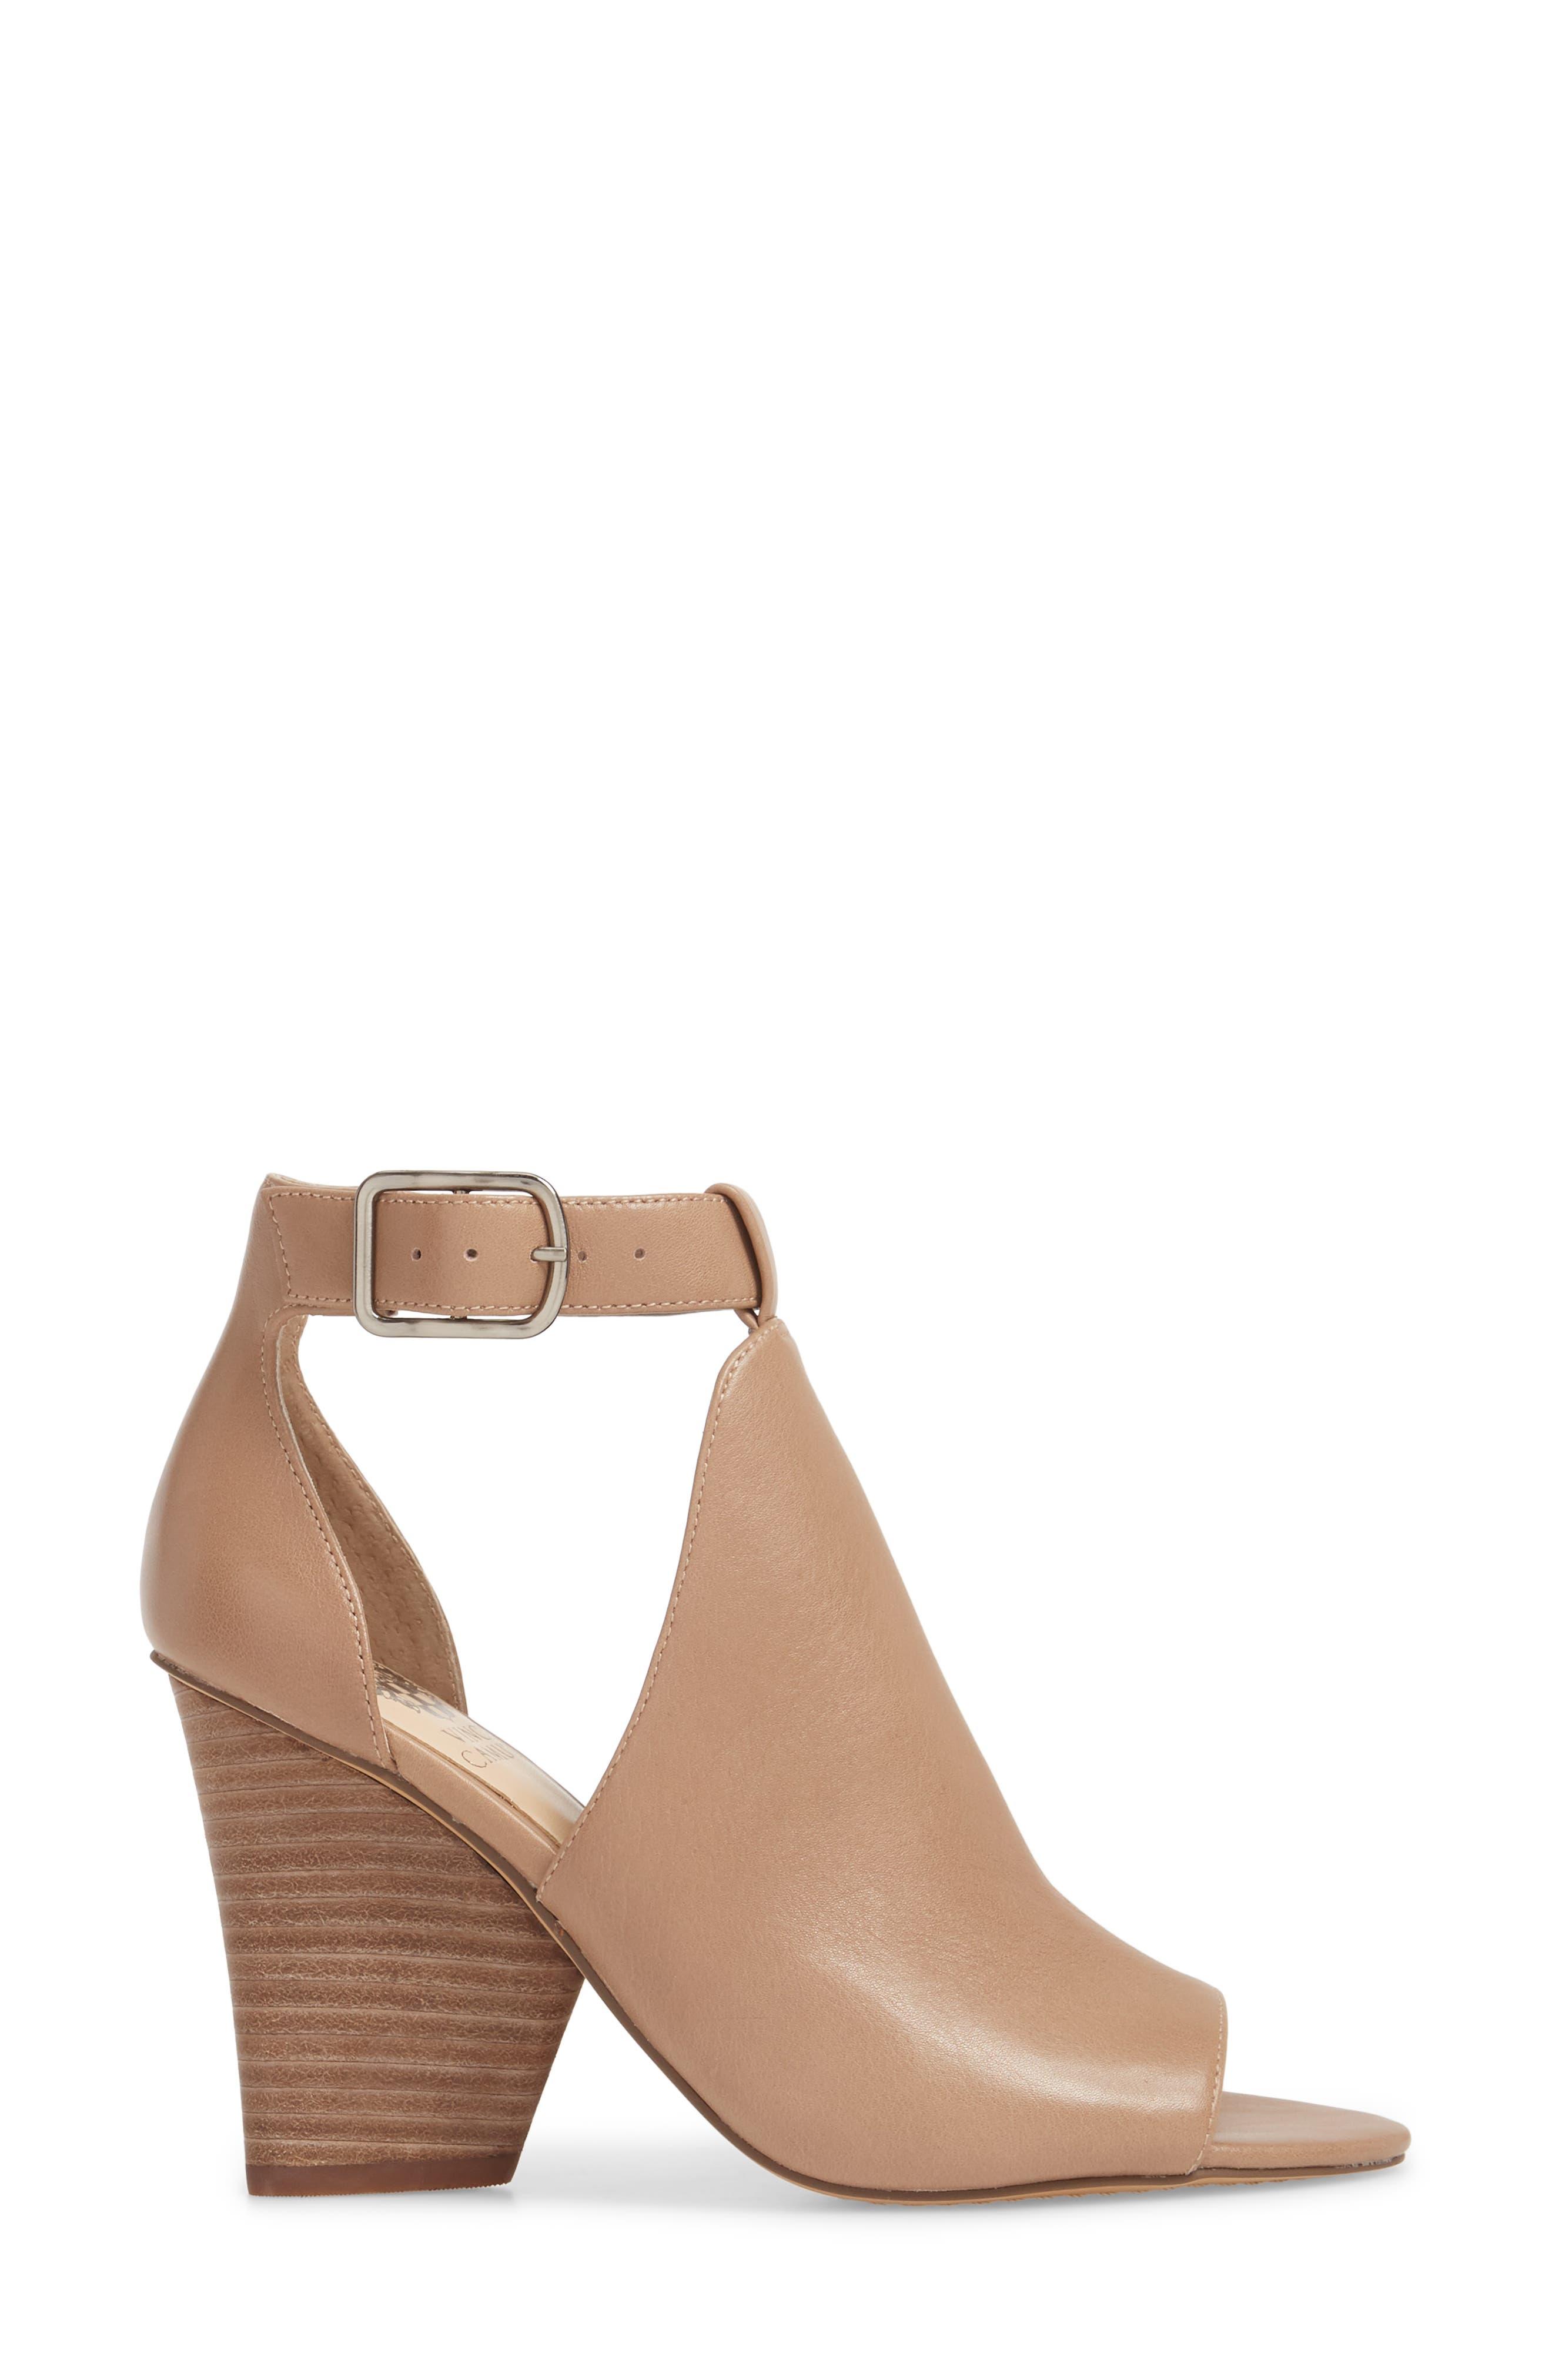 Adaren Peep Toe Sandal,                             Alternate thumbnail 3, color,                             Dusty Trail Leather